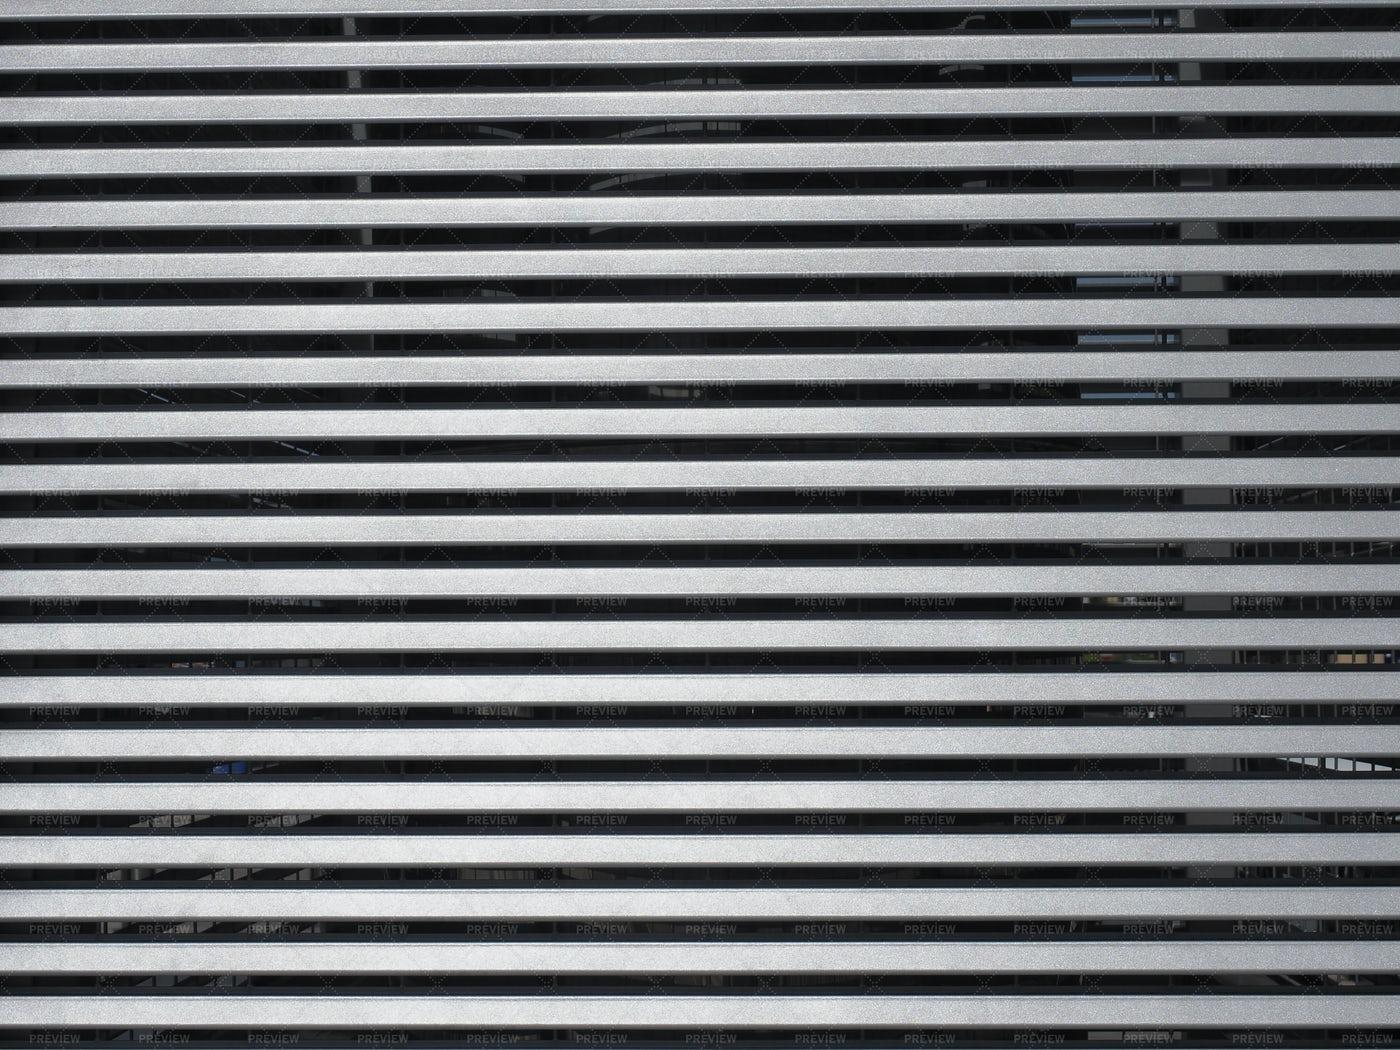 Industrial Metal Texture: Stock Photos